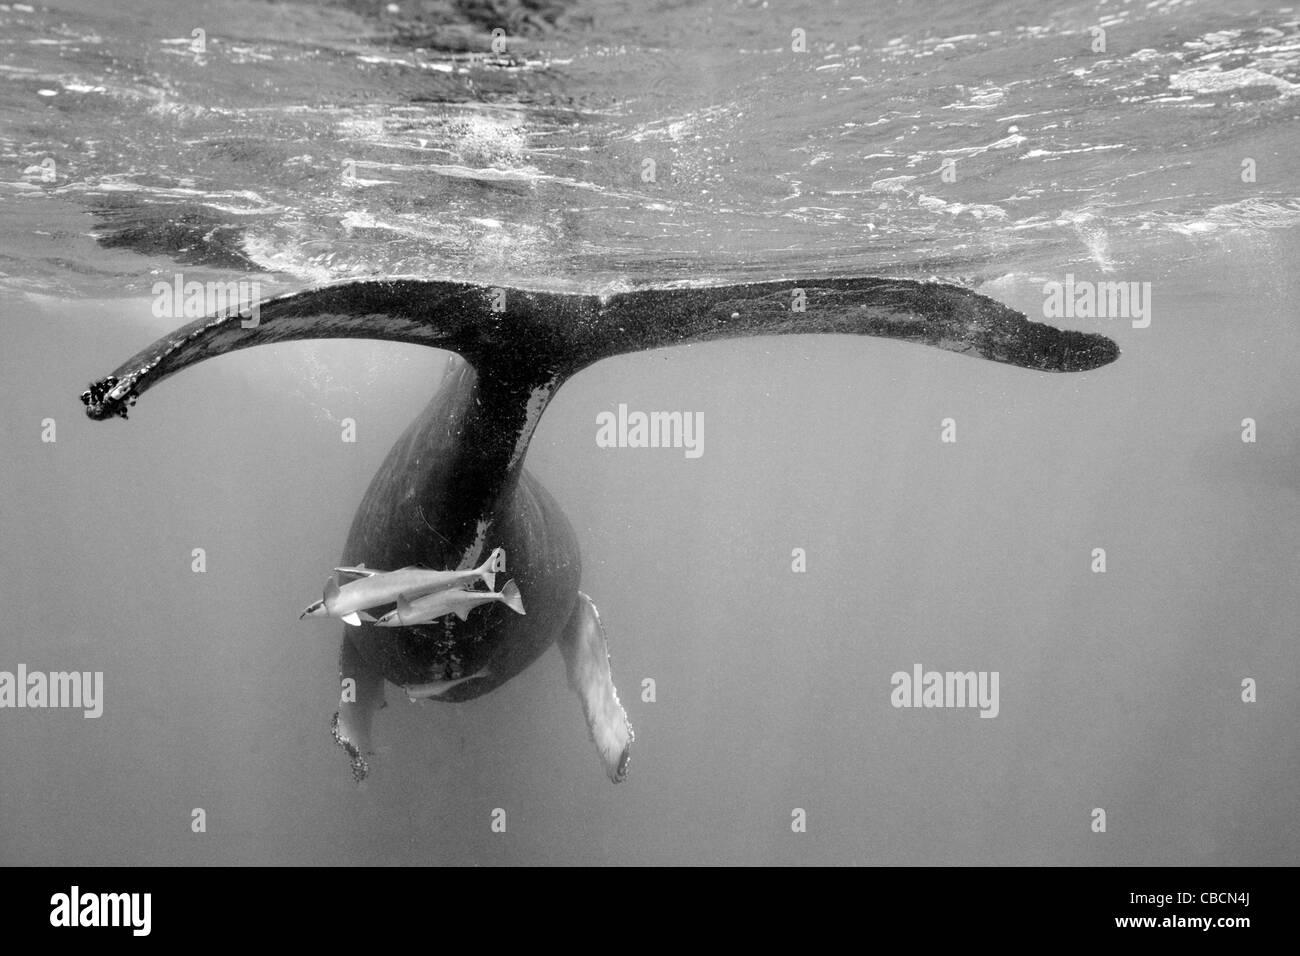 Humpback Whale, Megaptera novaeangliae, Silver Bank, Atlantic Ocean, Dominican Republic - Stock Image